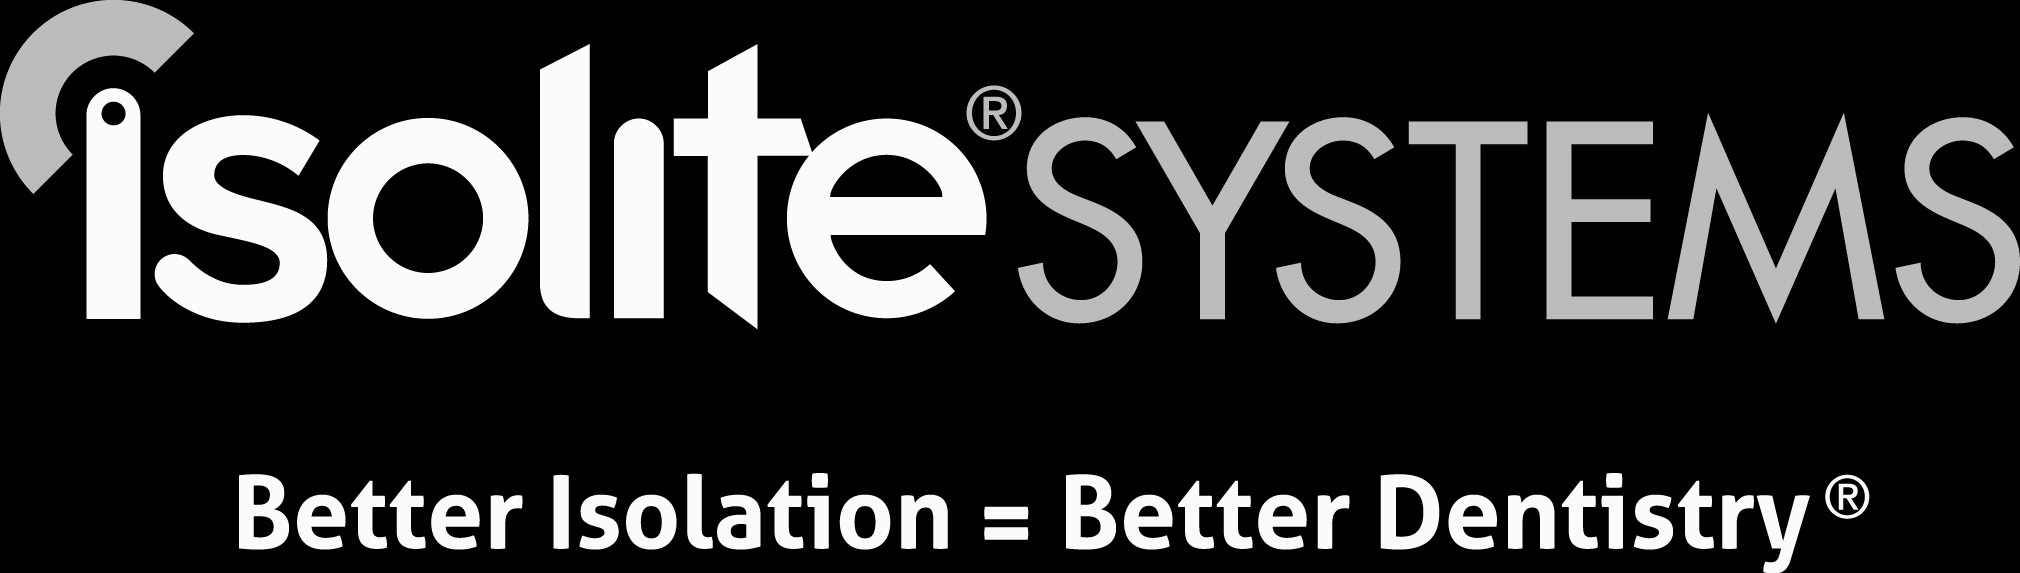 IsoliteSystems_BetterIsolation_Aller_RGB.jpg